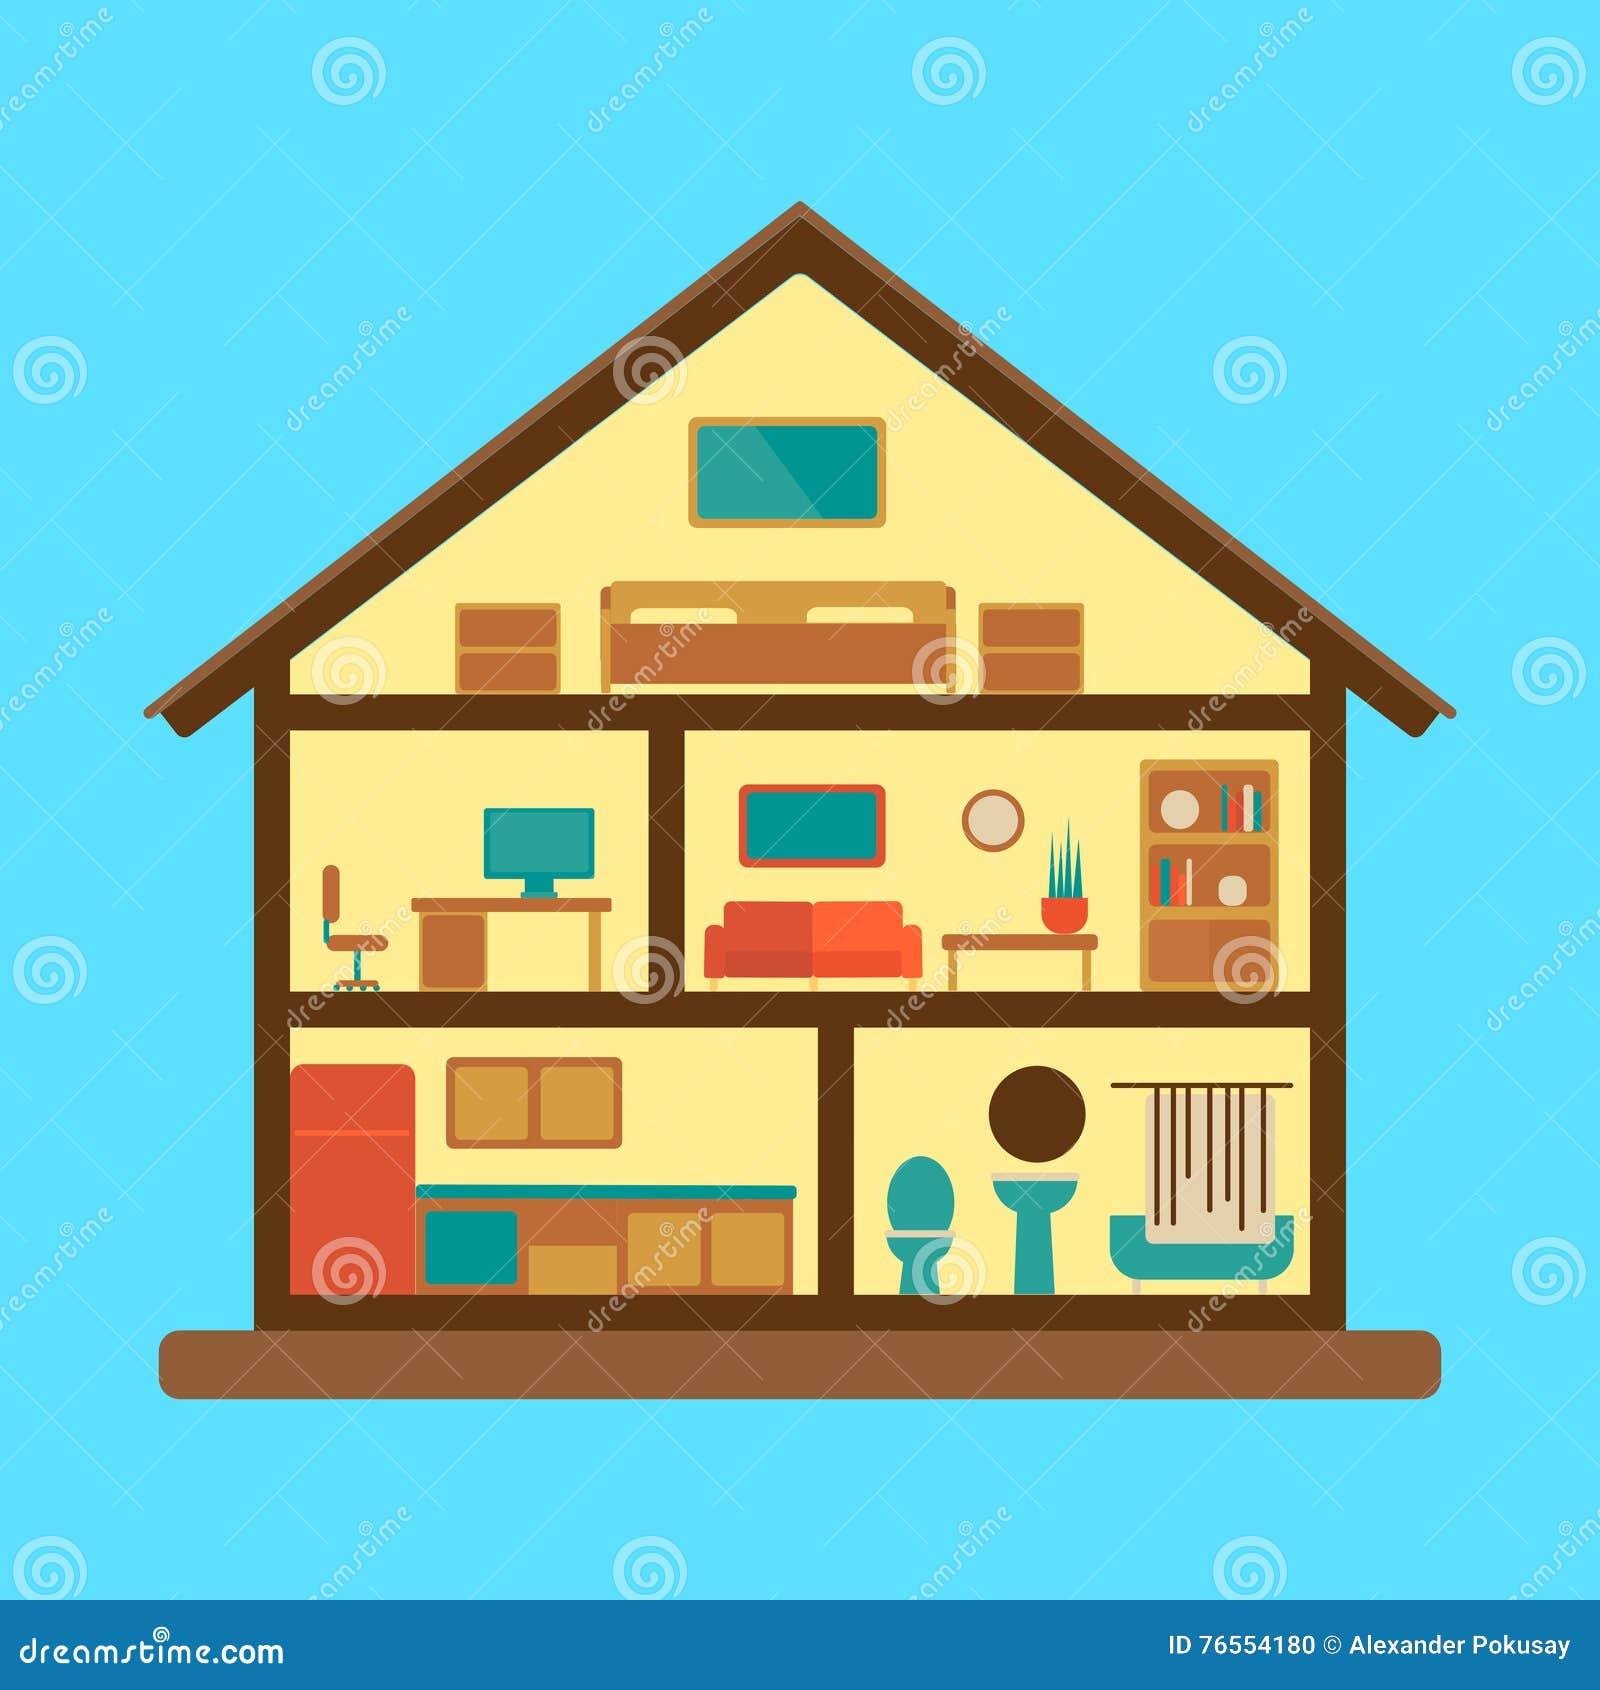 House Blueprint Icon Flat Style Vector Illustration Cartoondealer Com